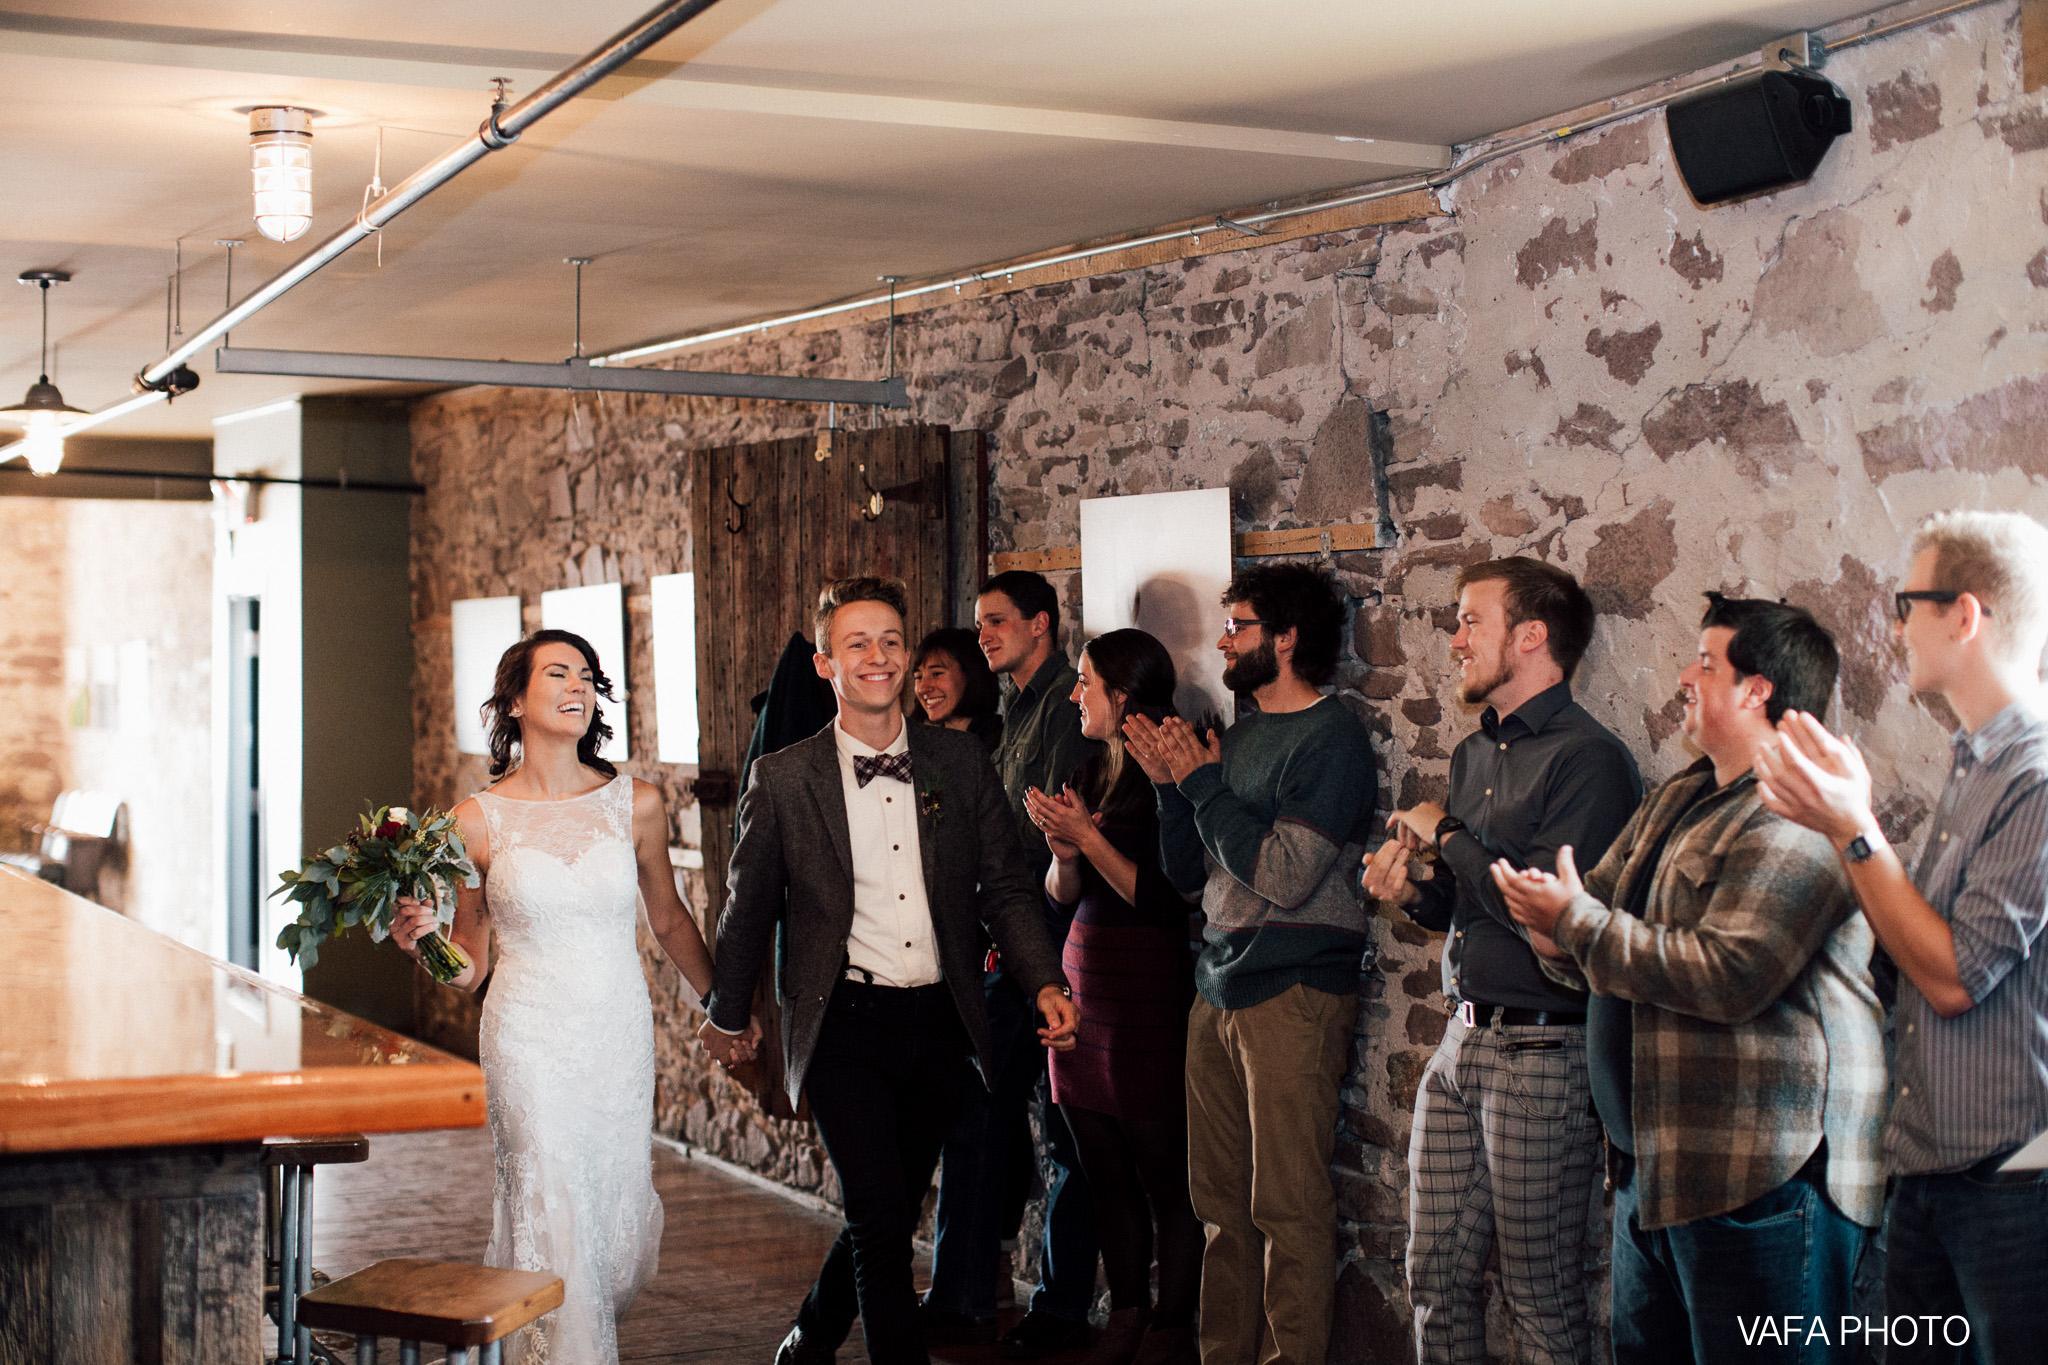 Hogback-Mountain-Wedding-Chelsea-Josh-Vafa-Photo-724.jpg